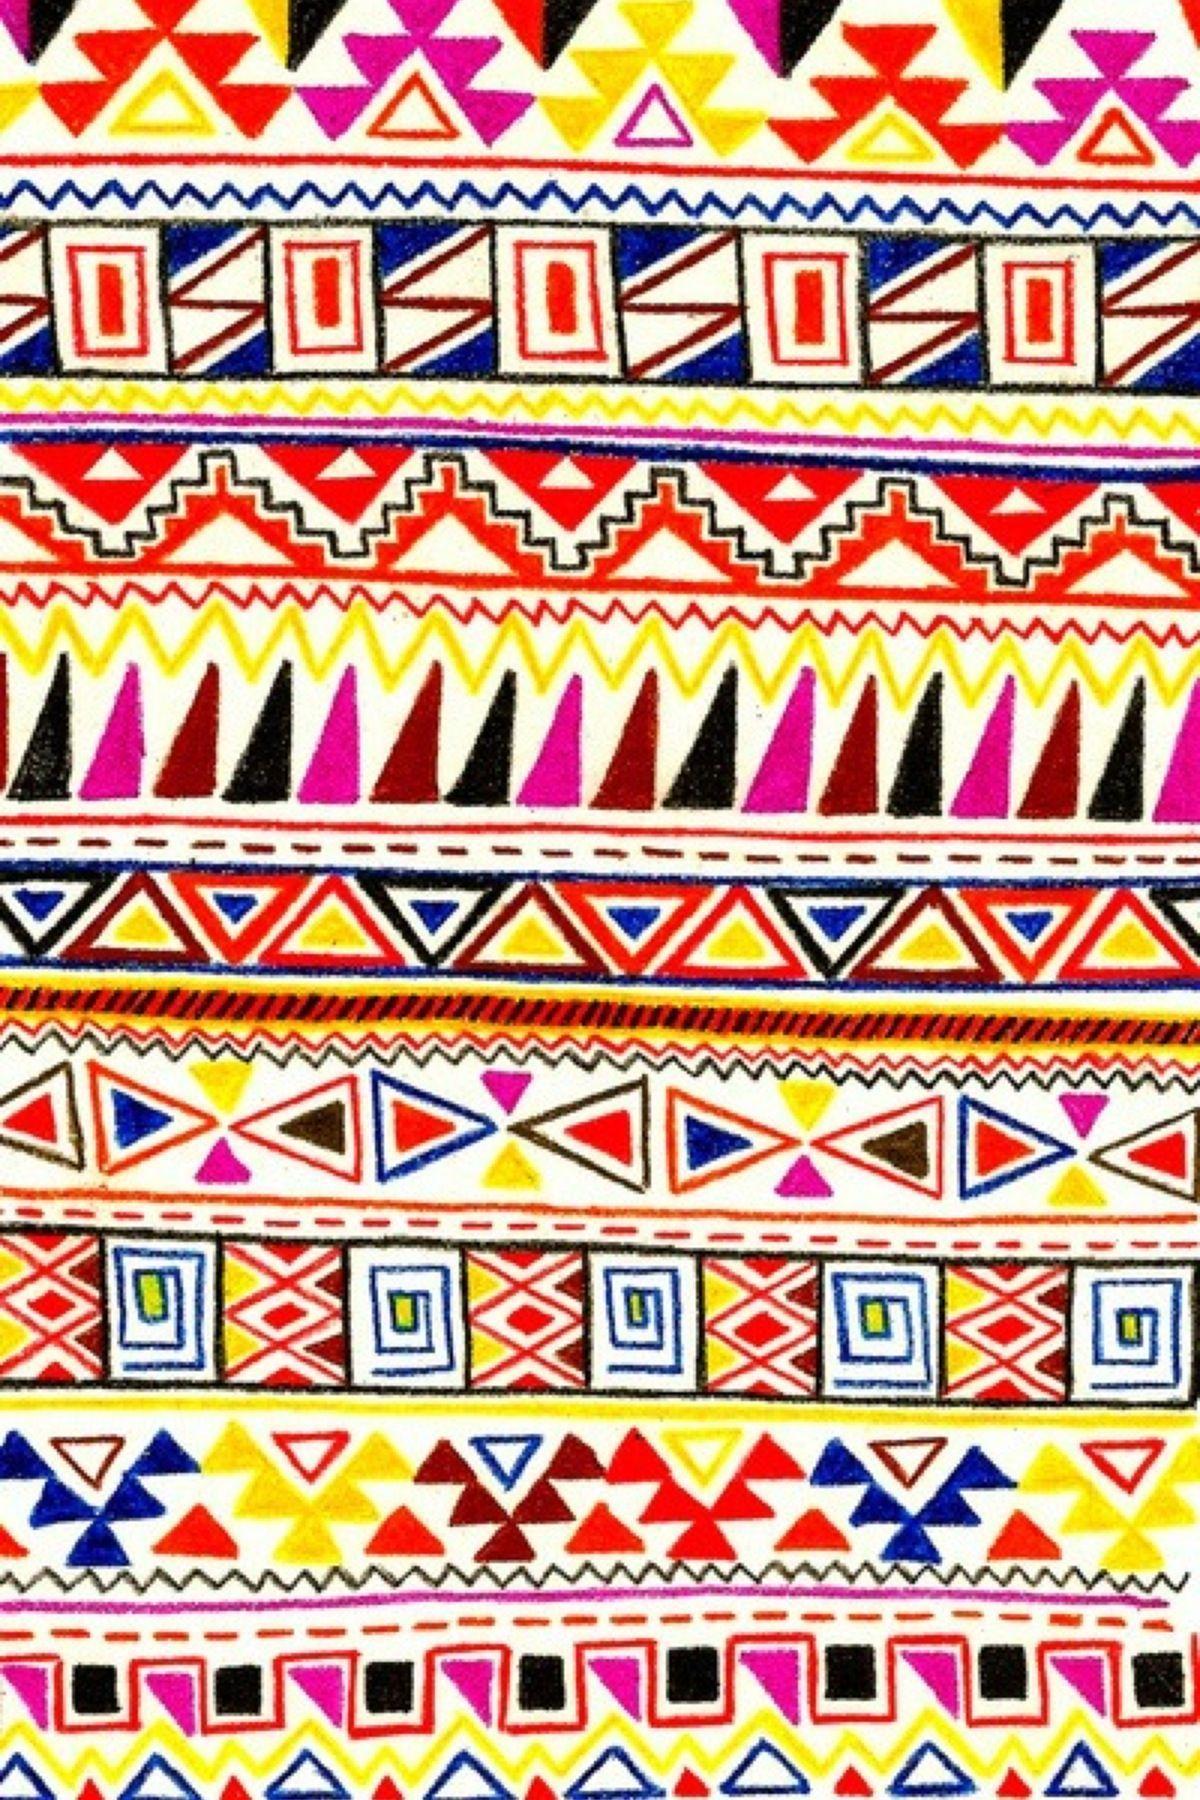 Cute Tribal Pattern Wallpapers - Top Free Cute Tribal ...